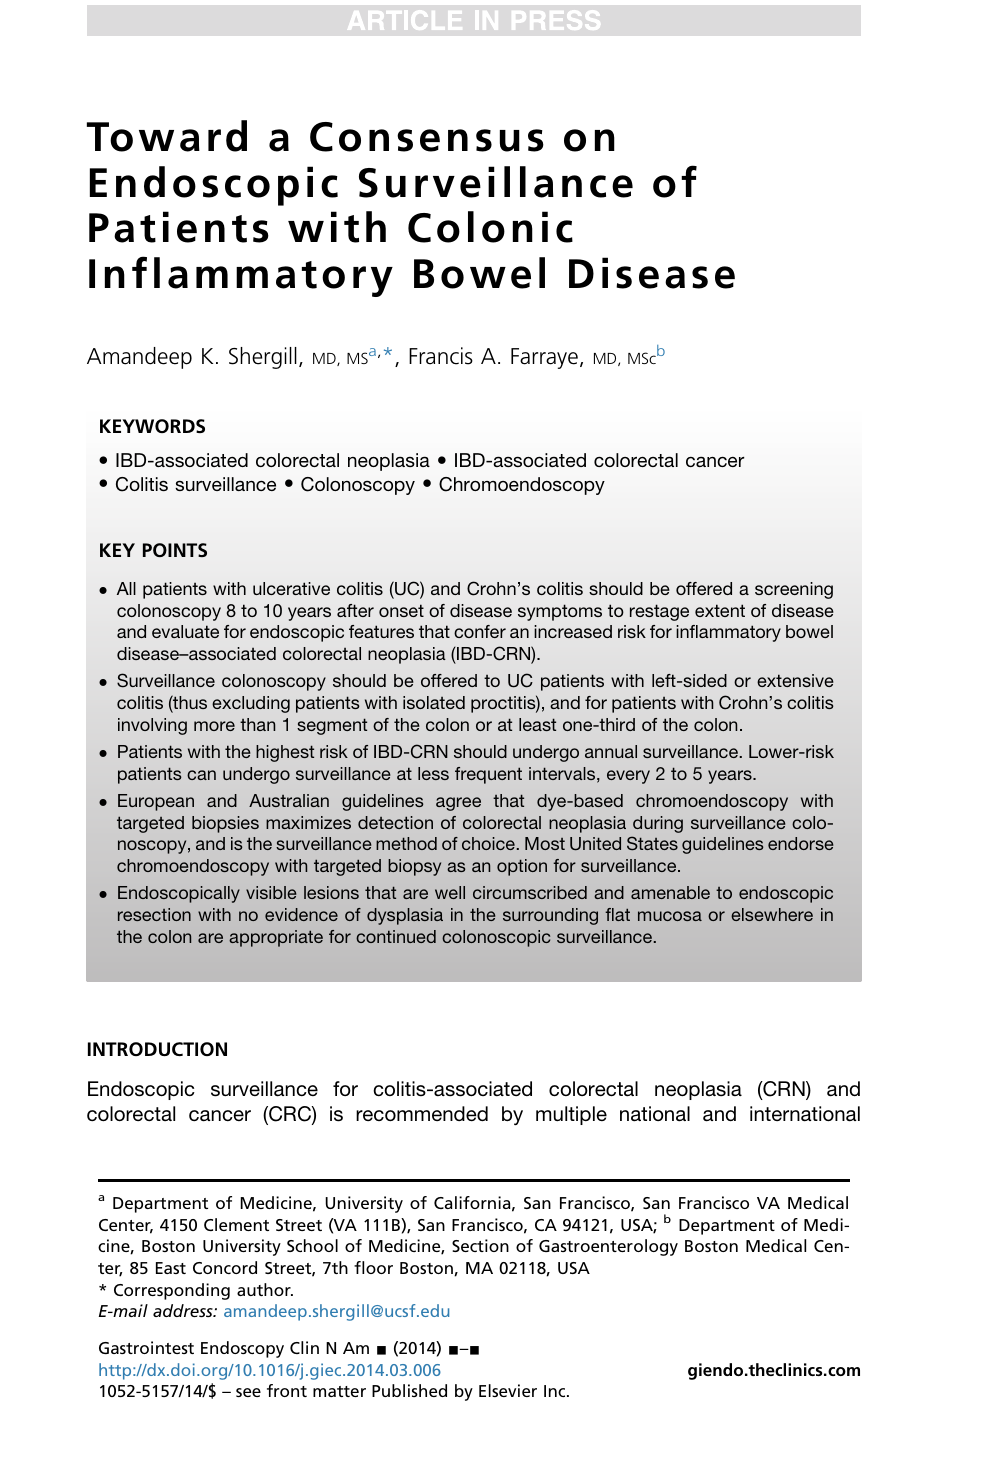 hesi case study irritable bowel syndrome